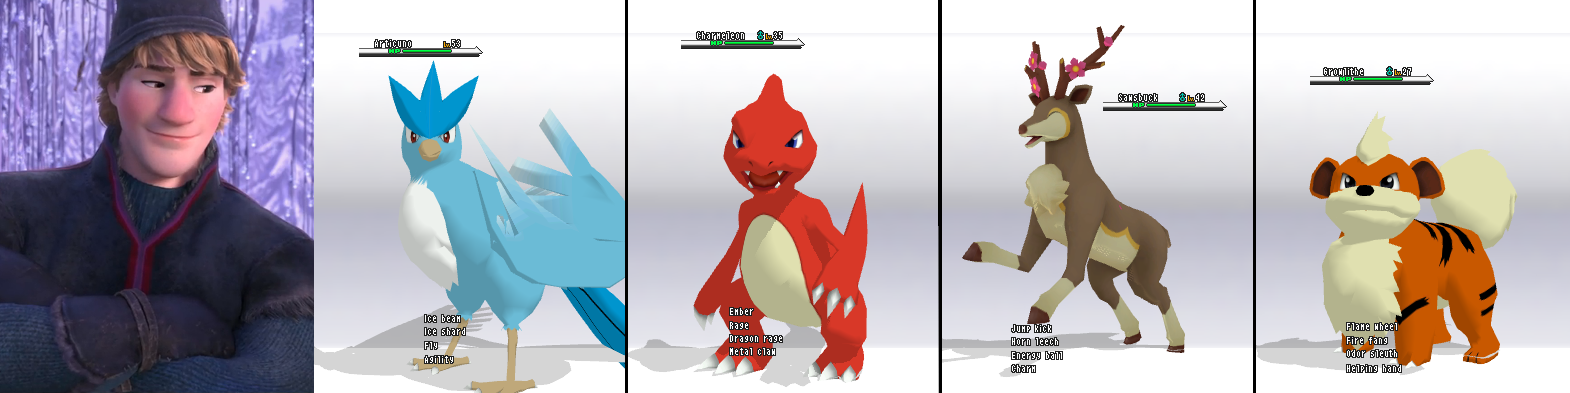 Crossover Frozen-PKMN - Kristoff's team by JackFrostOverland